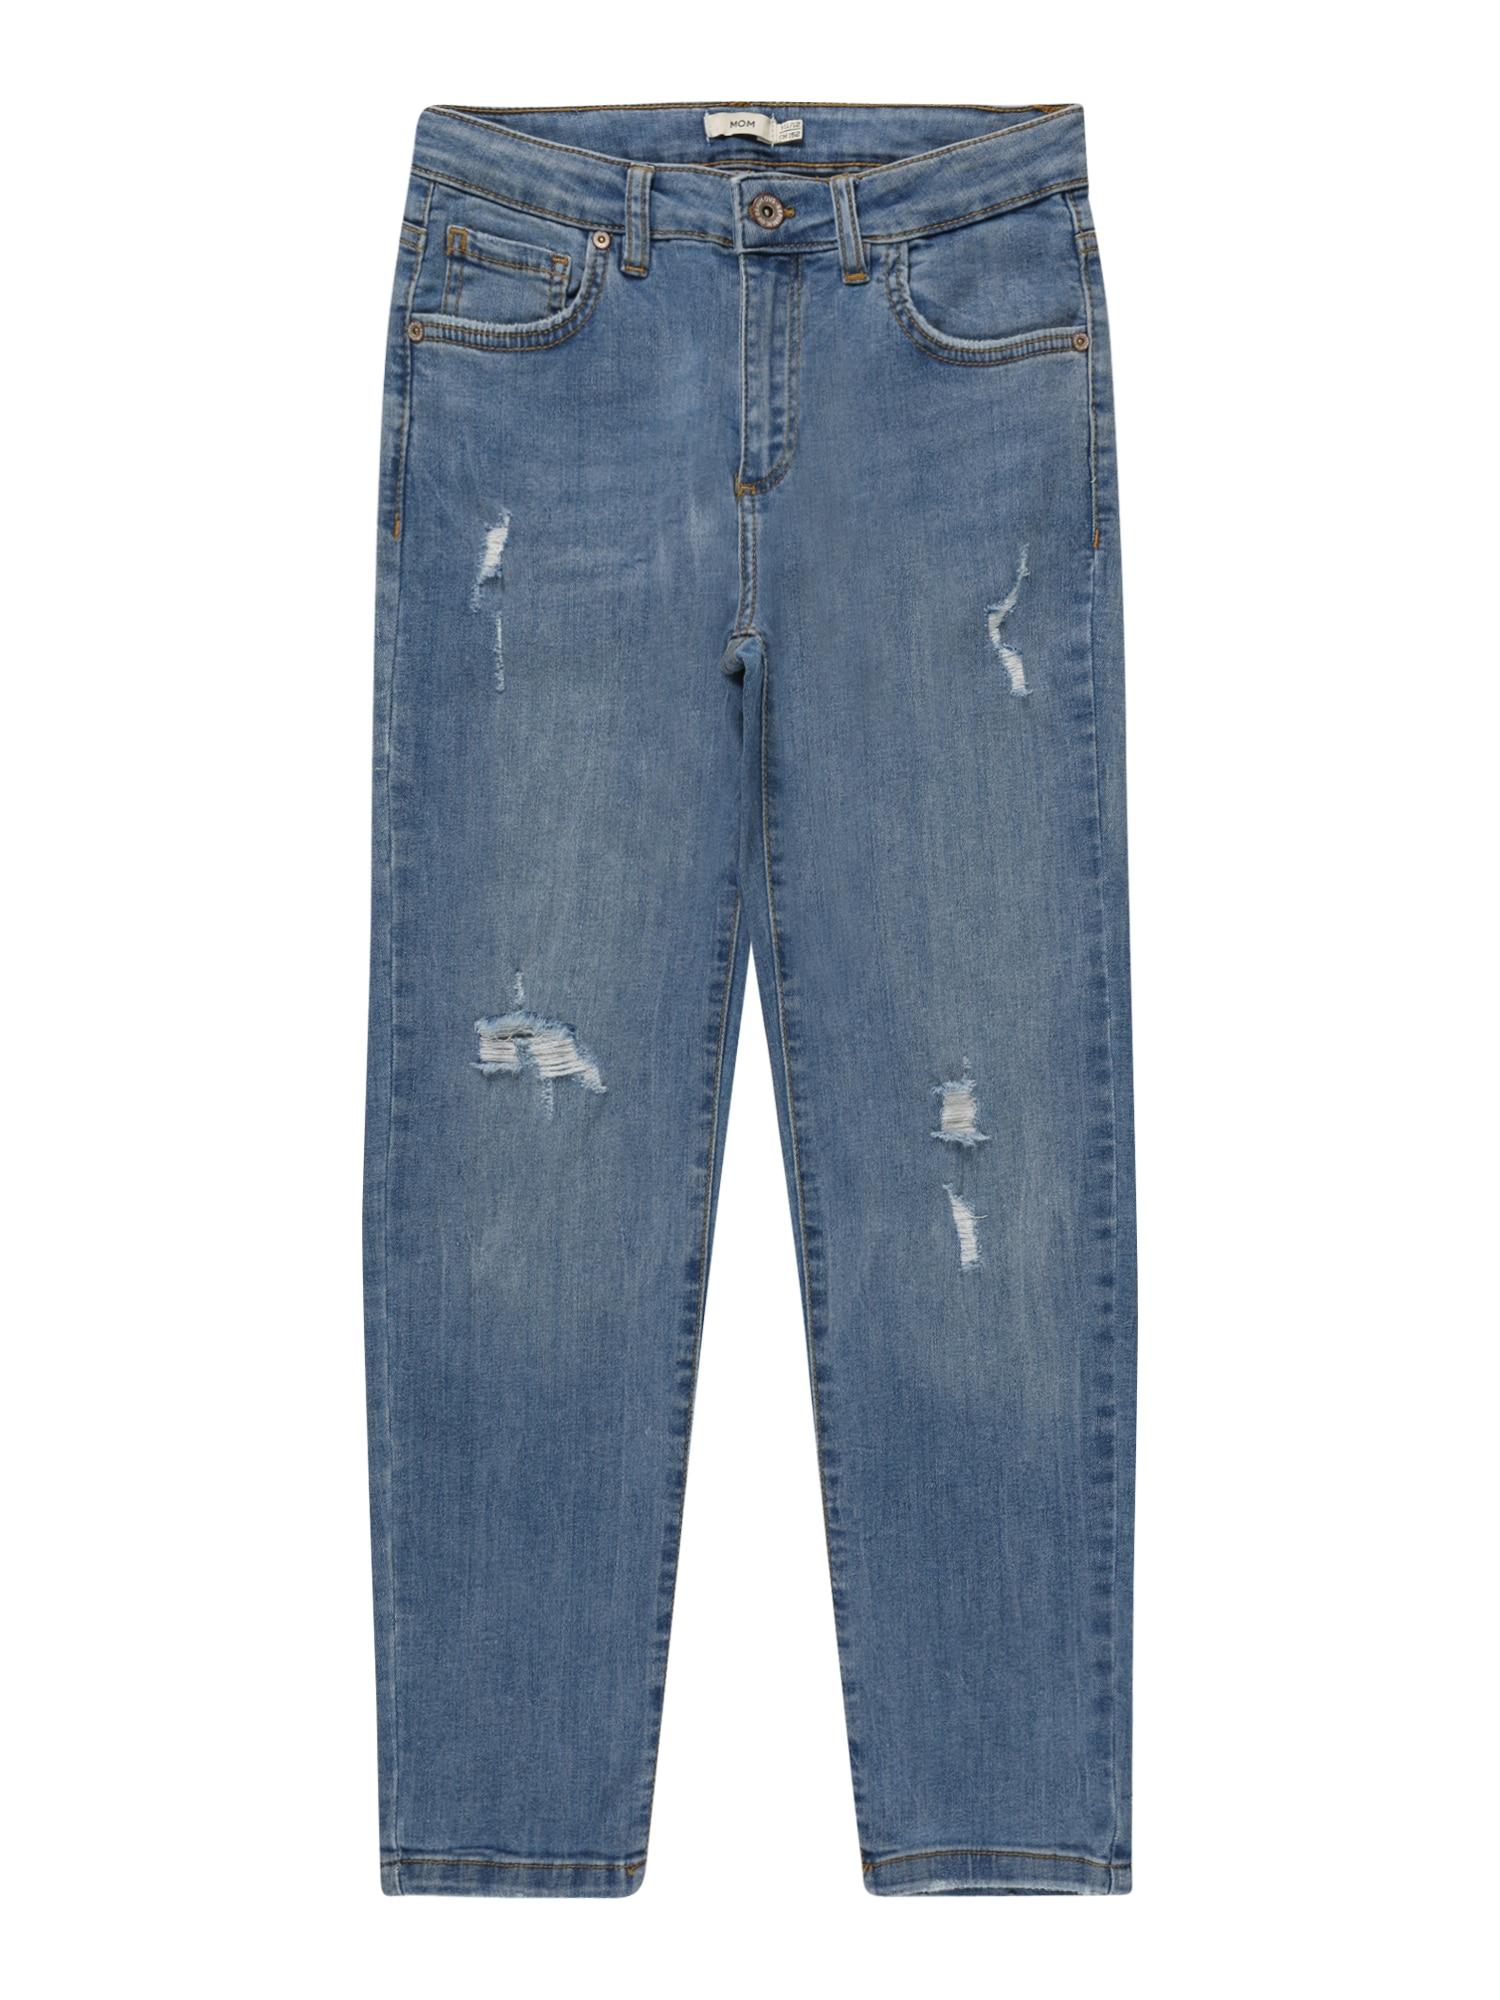 OVS Džinsai tamsiai (džinso) mėlyna